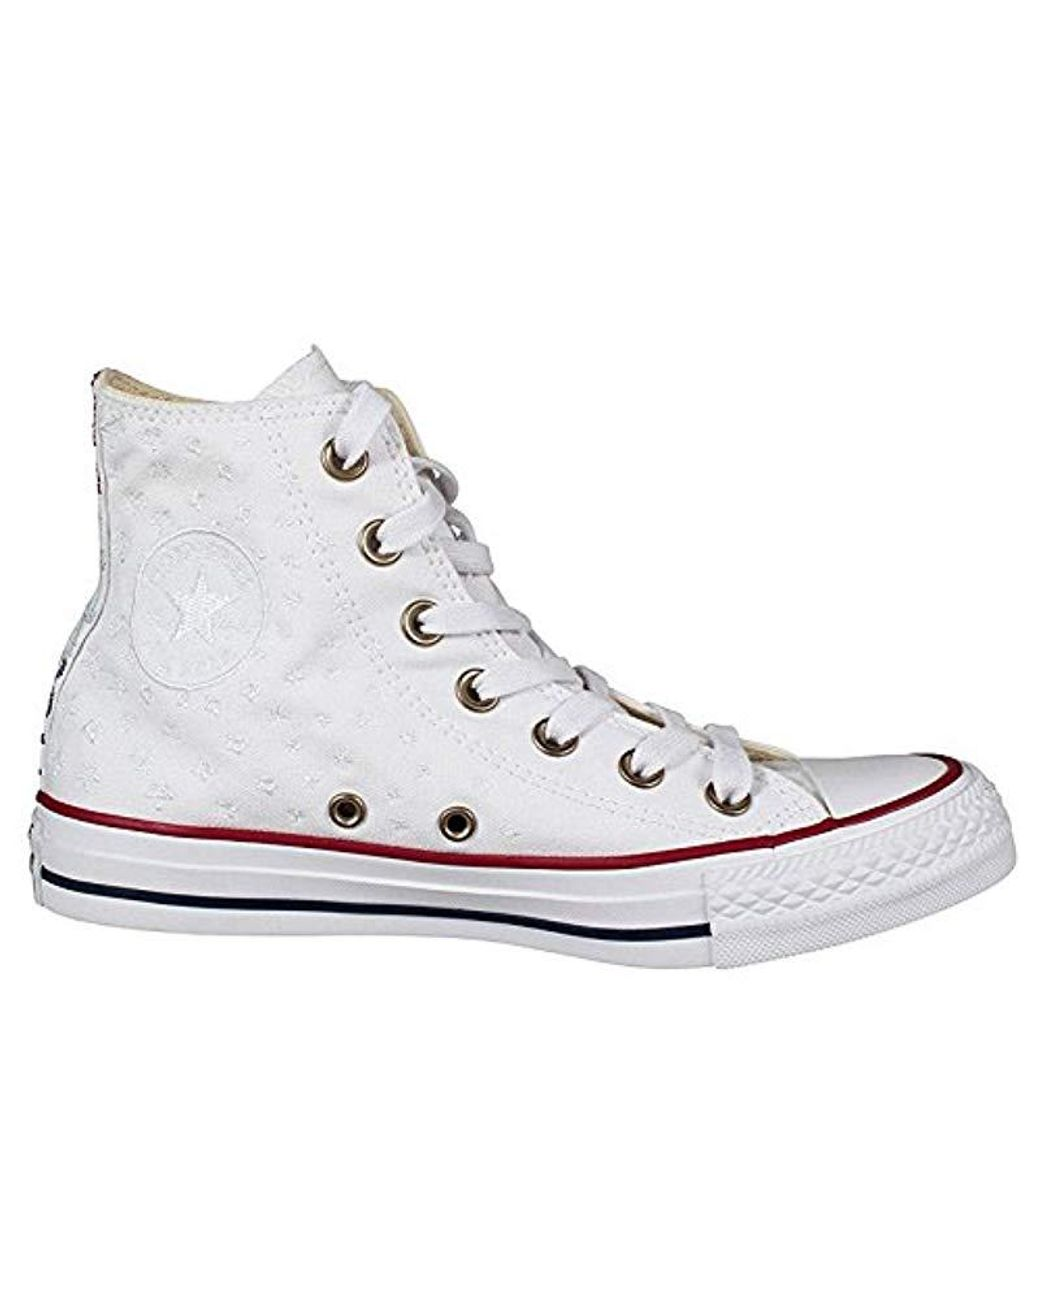 Converse Ladies Chucks 559886c All Star High Sneaker Metallic Finish White